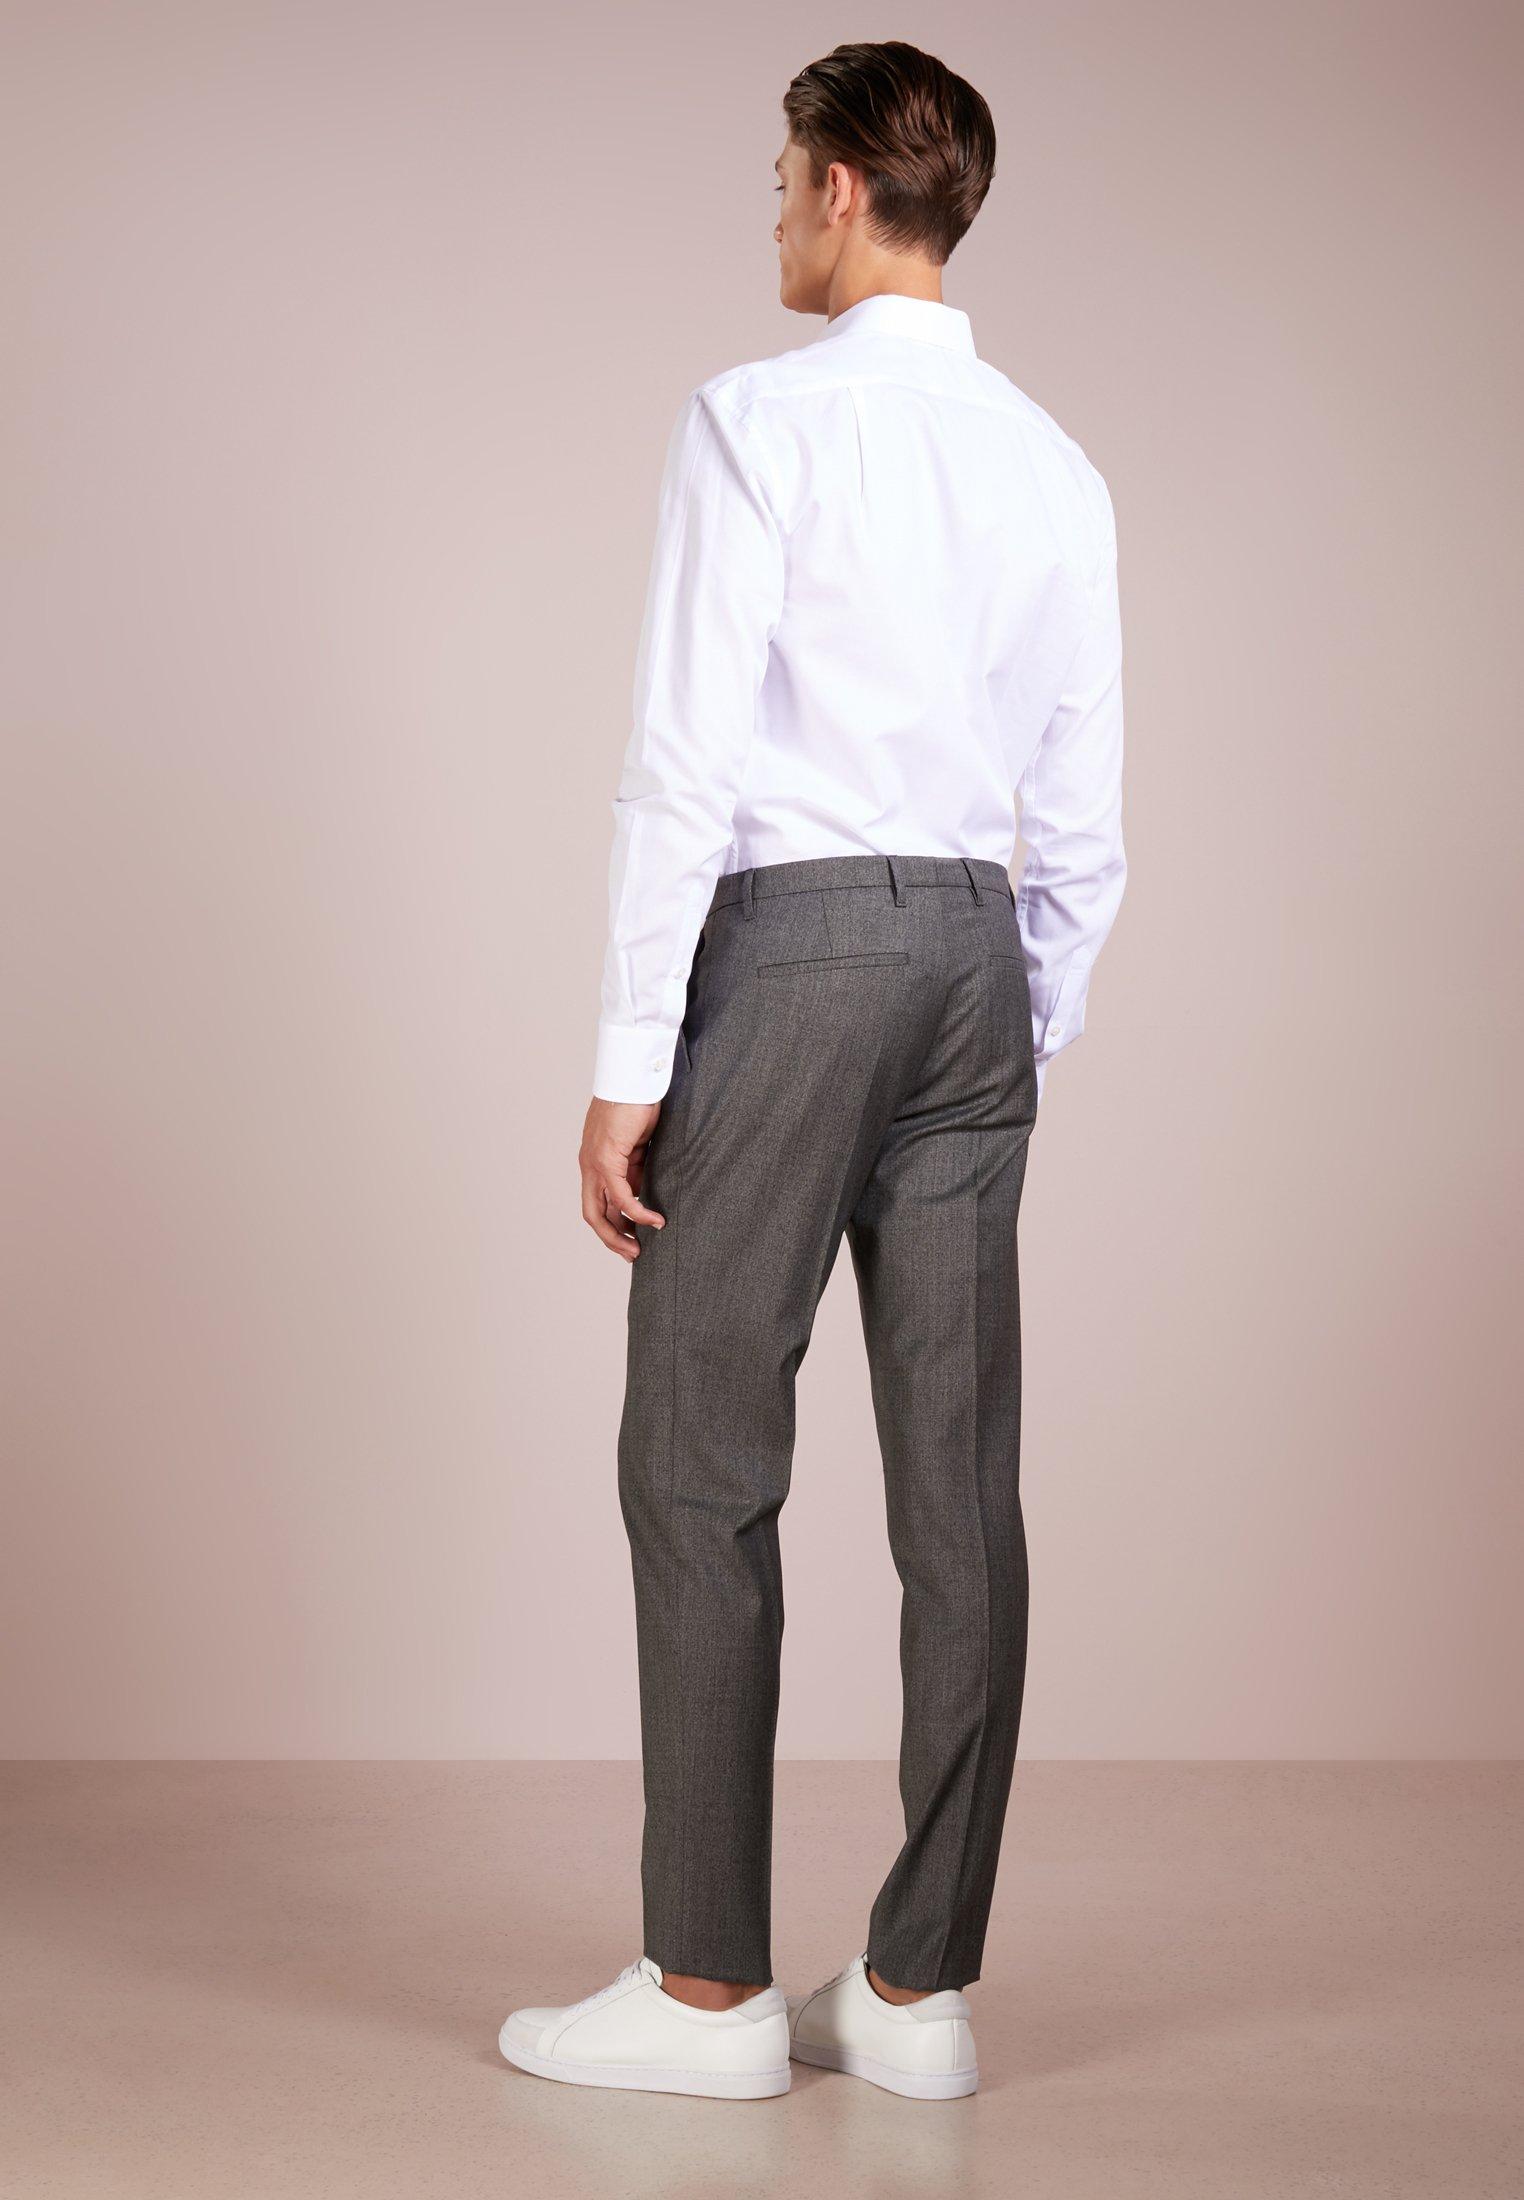 De FootPantalon Grau Costume Drykorn 3TlKuF1Jc